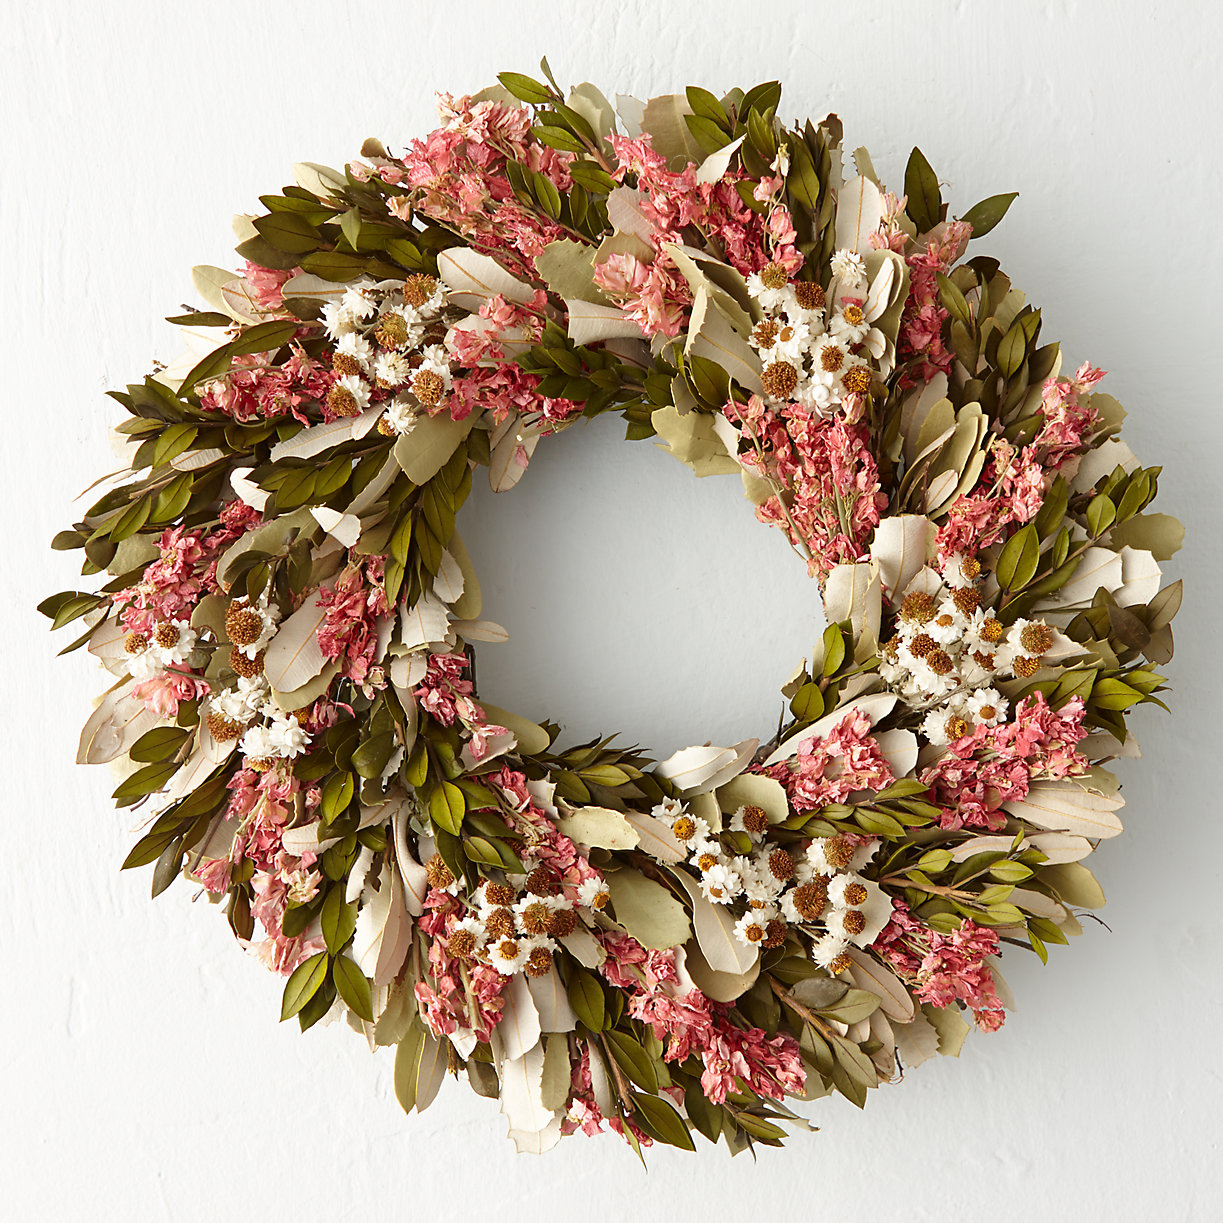 Lovely garden wreath from Terrain